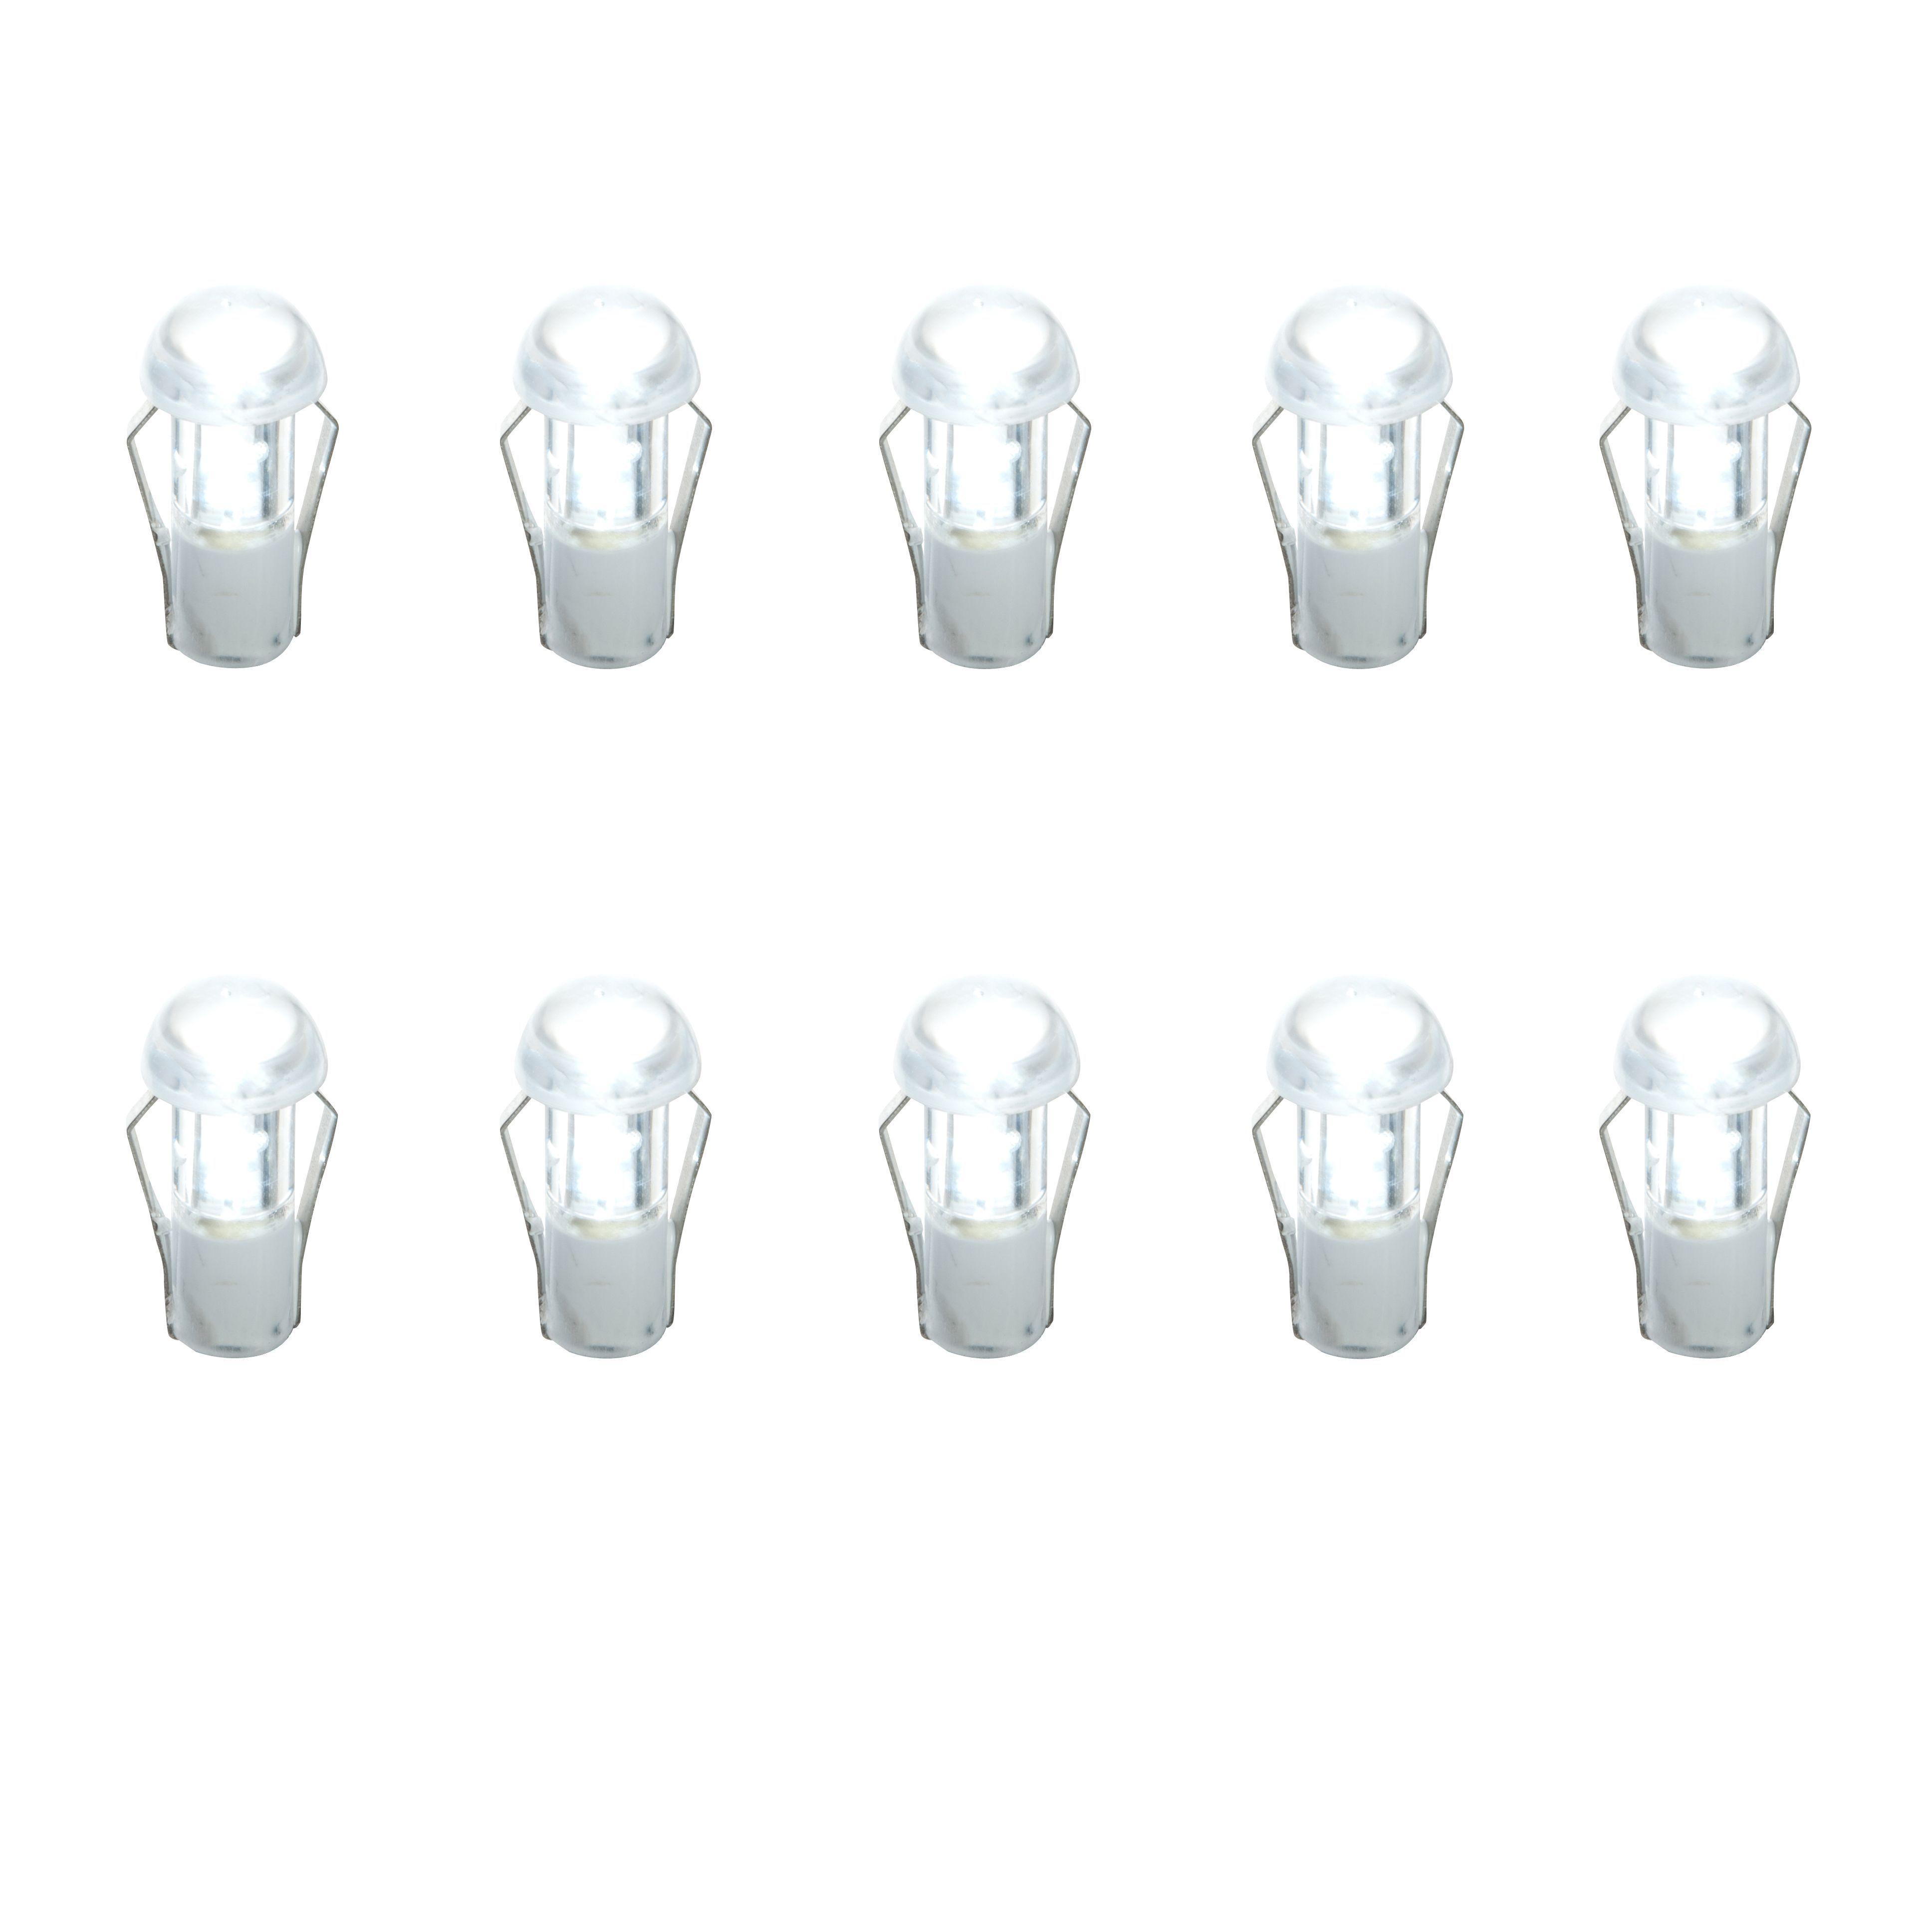 Masterlite Mains Powered Led Cabinet Light, Pack Of 10